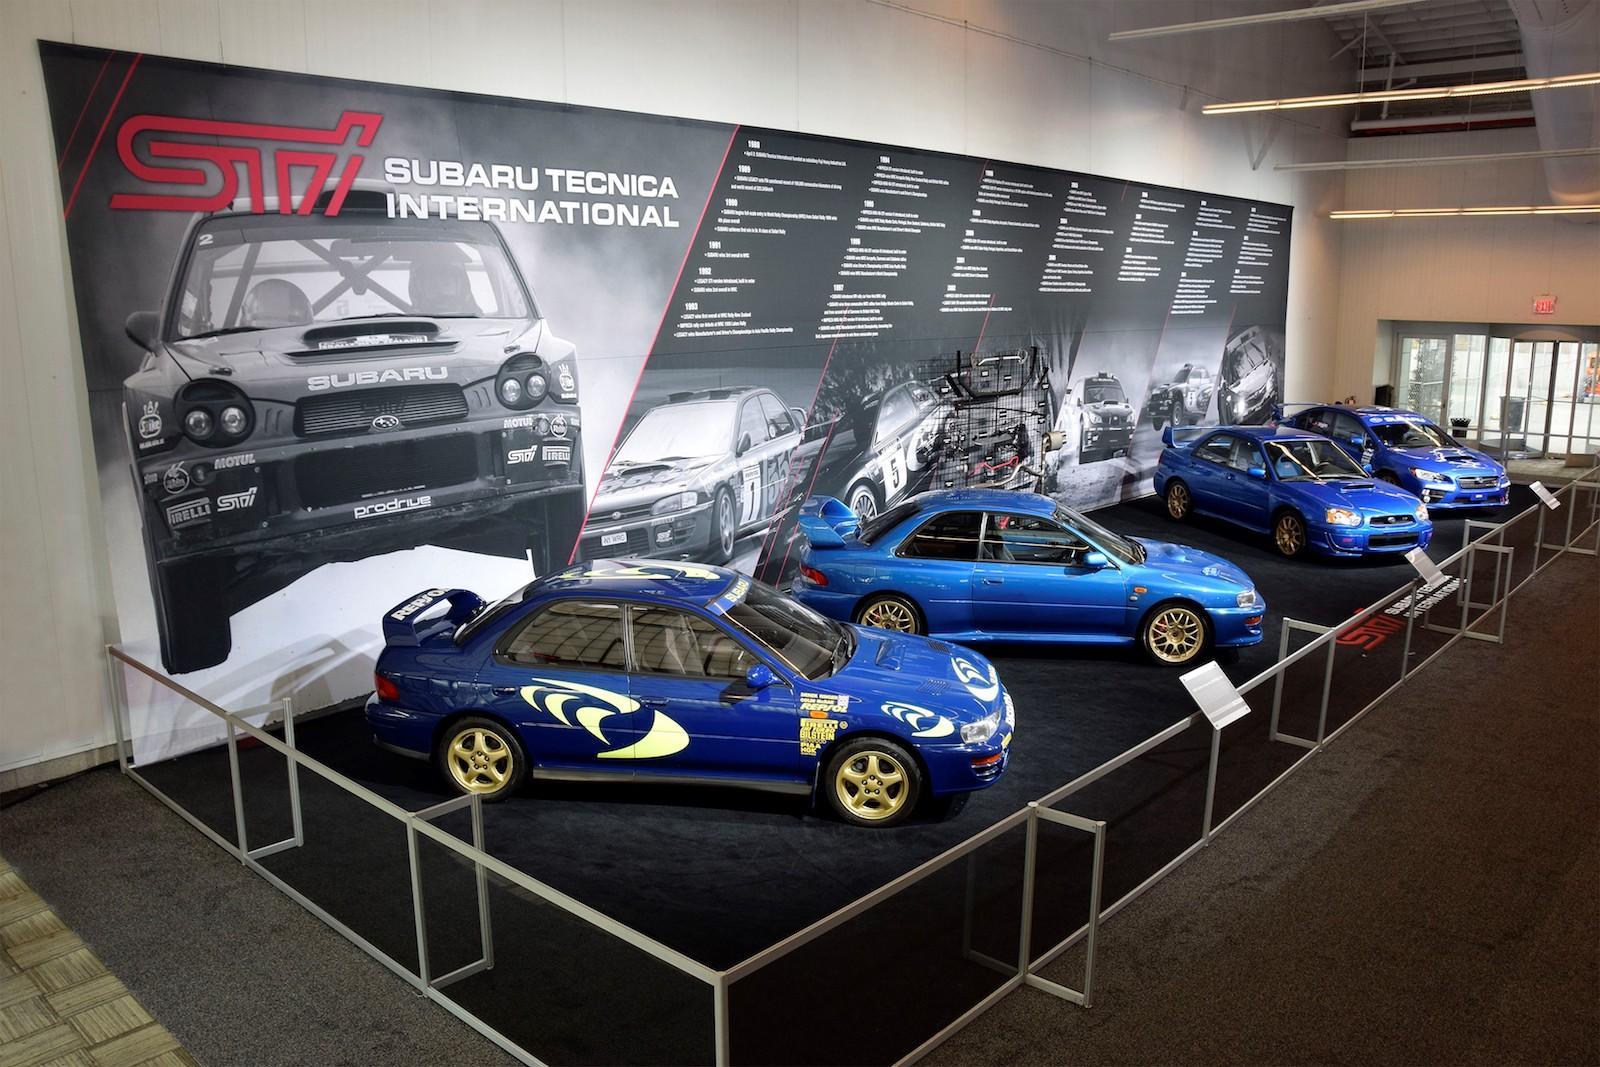 30 years of Subaru STI performance madness!